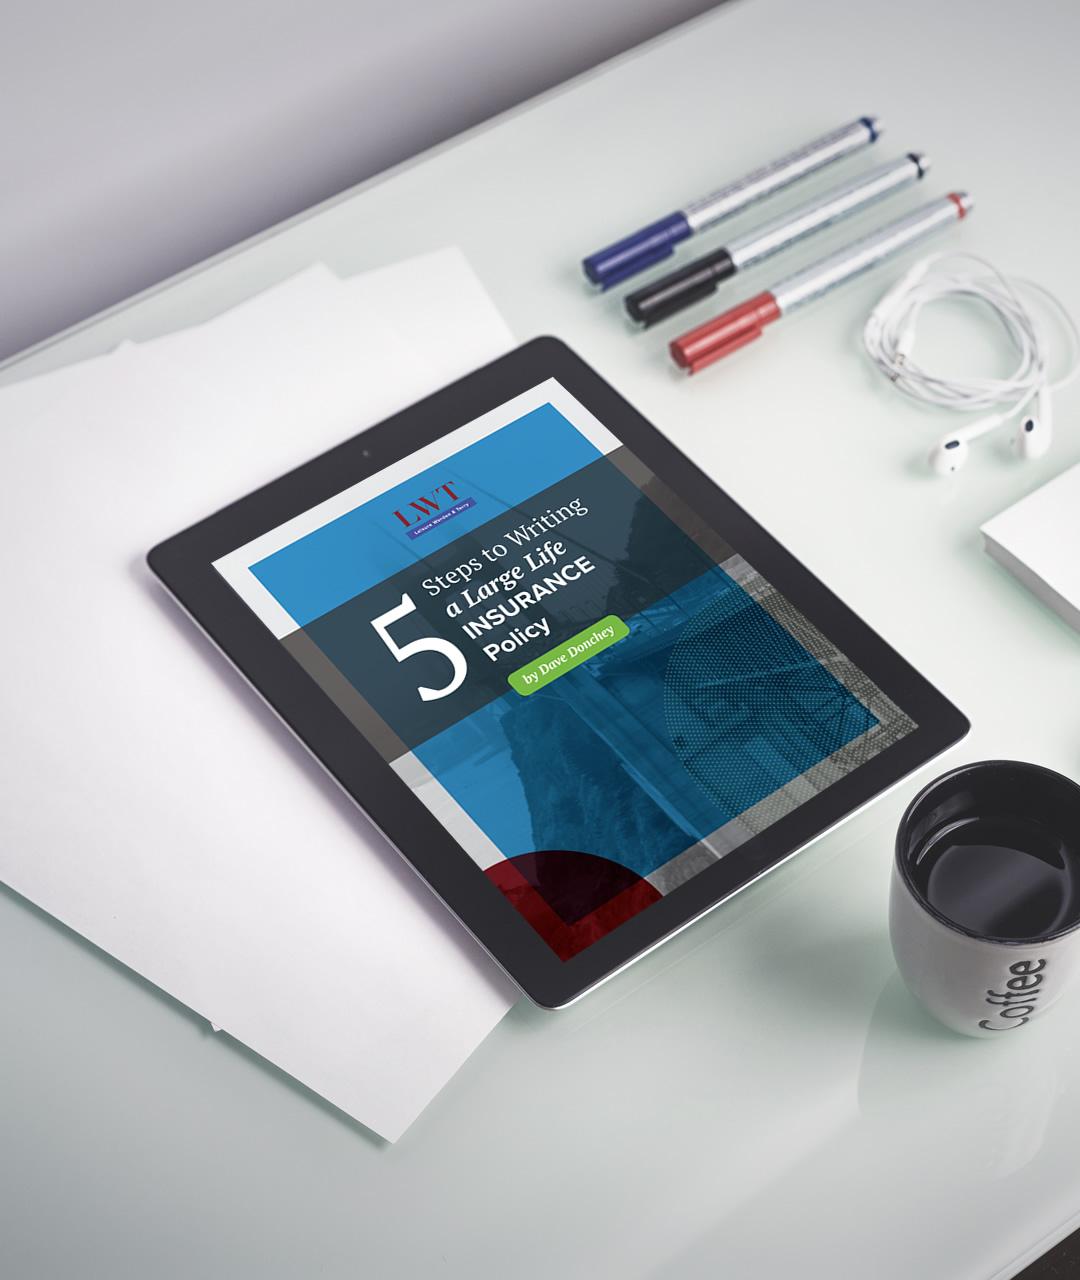 lwt-ebook-1